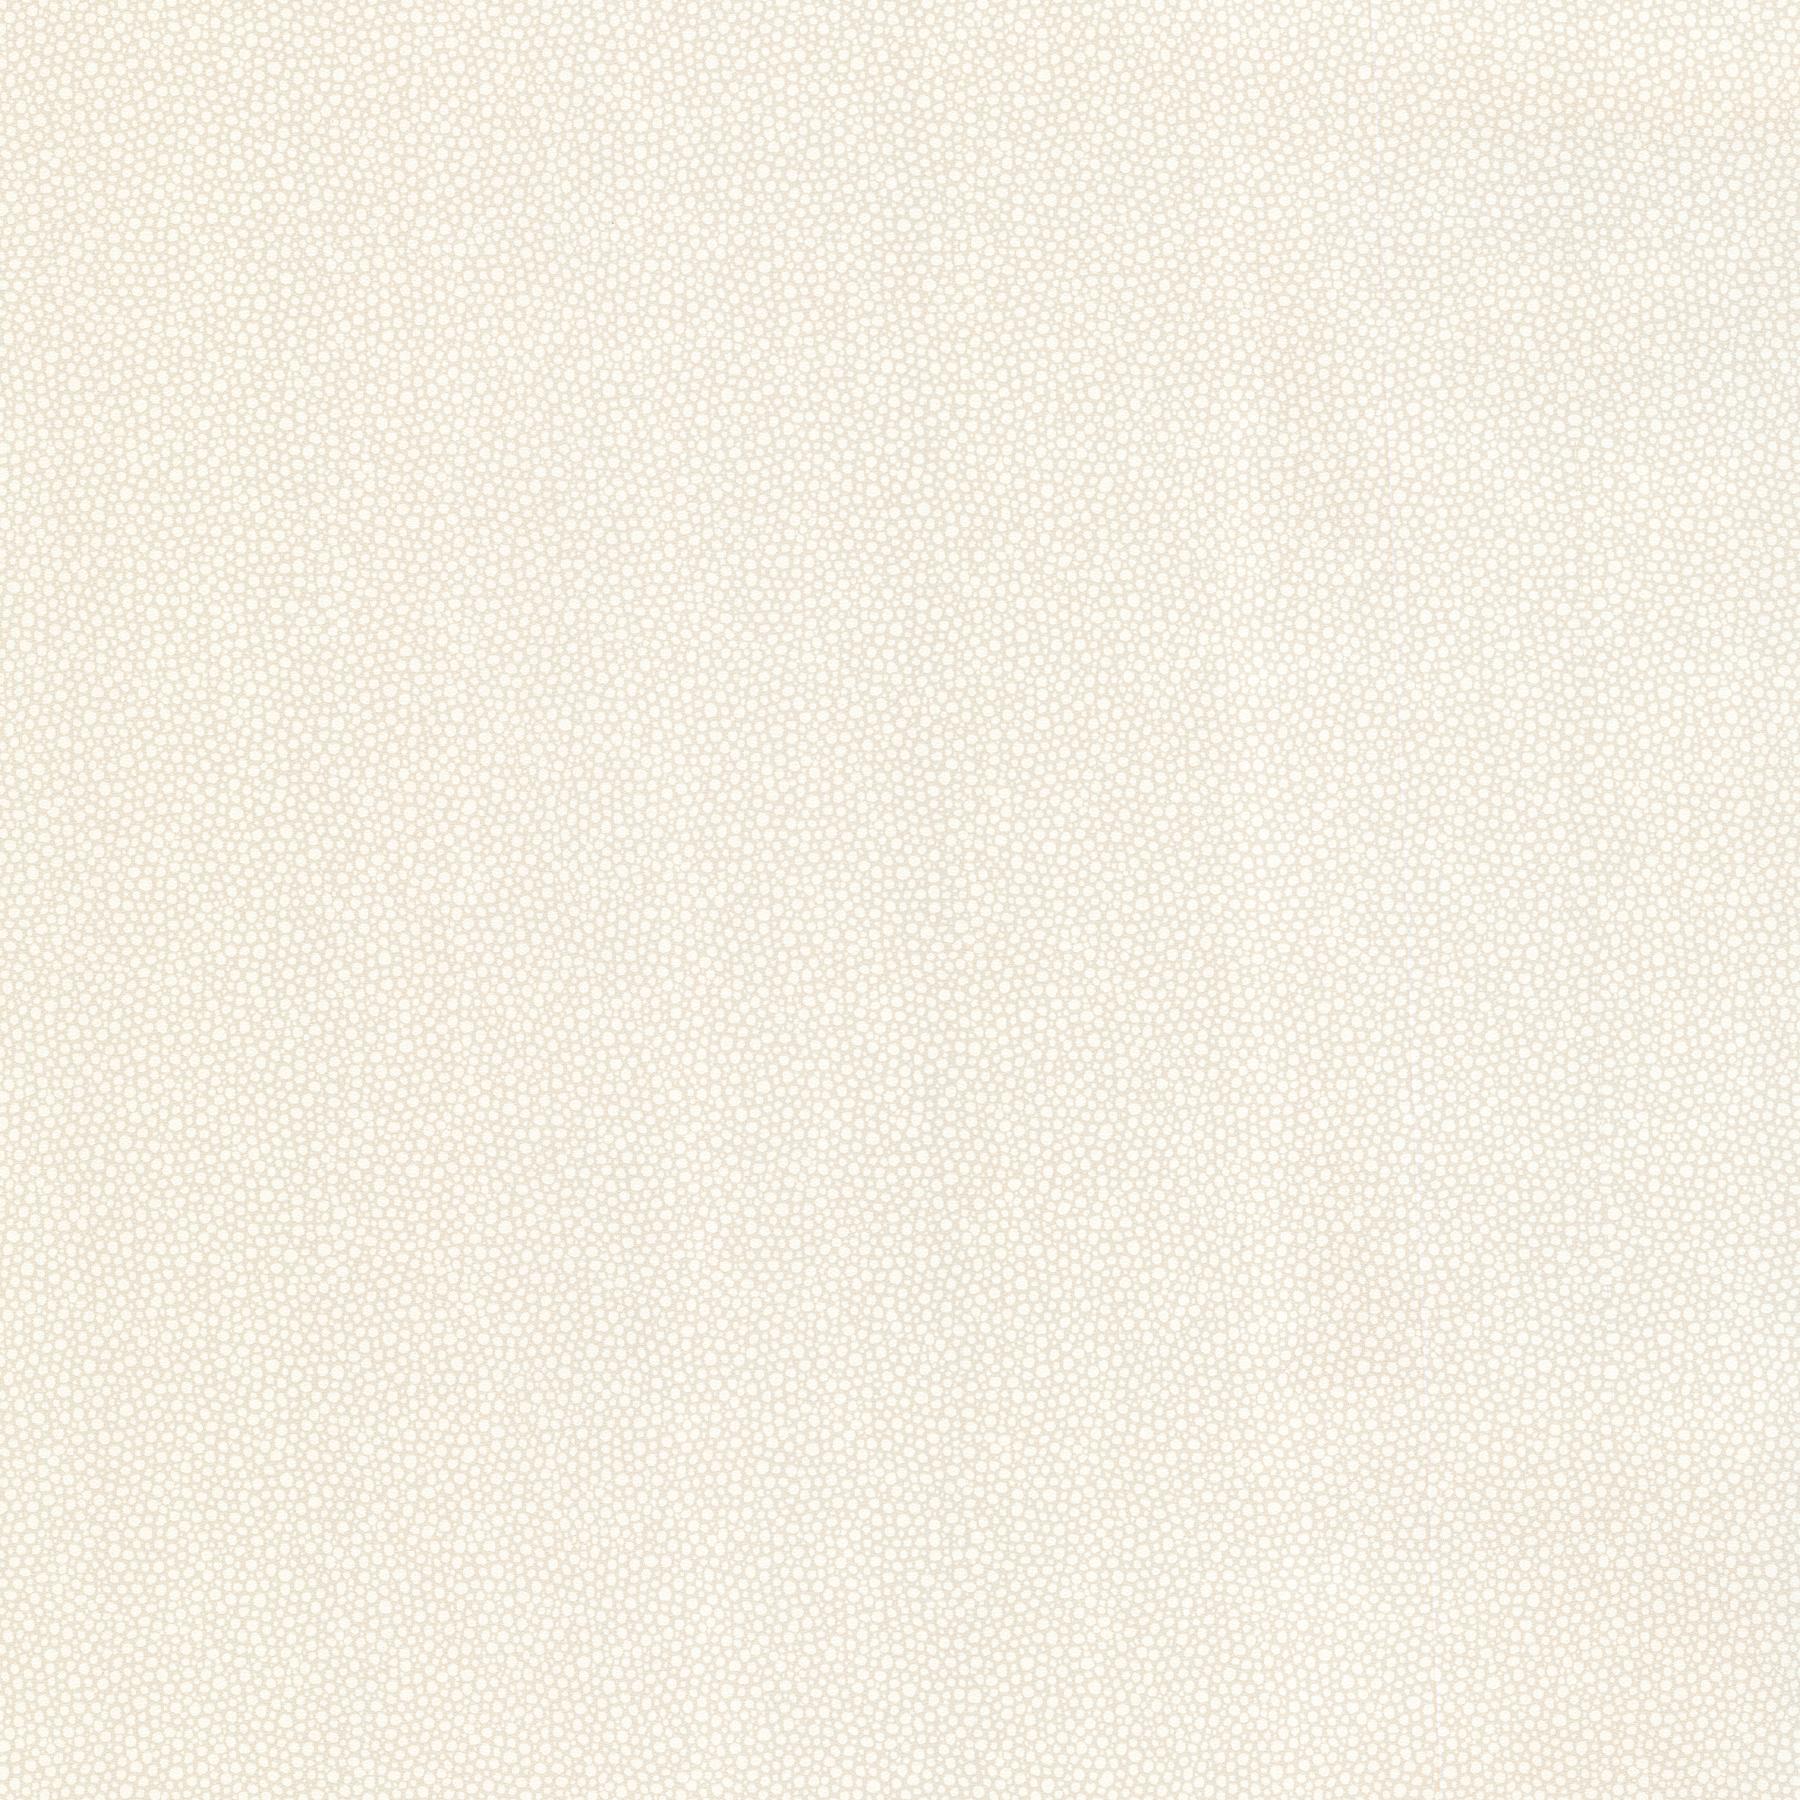 Picture of Bess Bone Bubble Texture Wallpaper